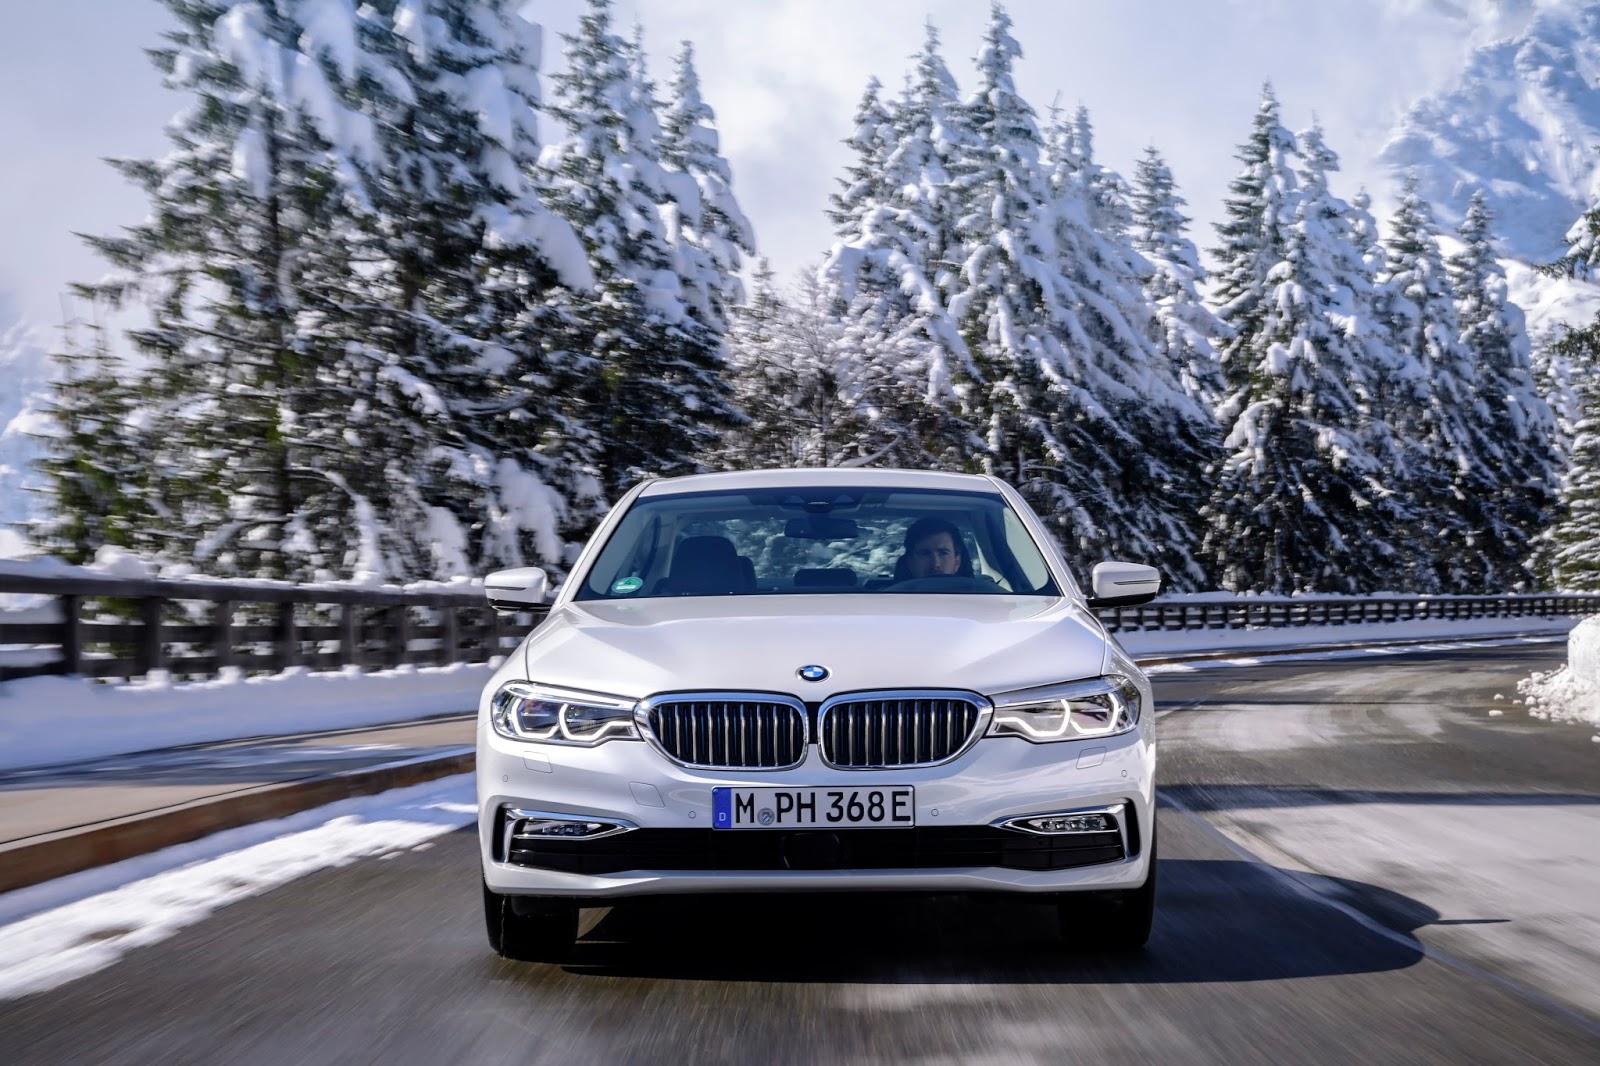 P90256337 highRes the new bmw 530e ipe Η BMW 530e iPerformance φέρνει την ηλεκτρική επανάσταση BMW, BMW 5, BMW 530e iPerformance, Electric cars, Hybrid, Λανσάρισμα